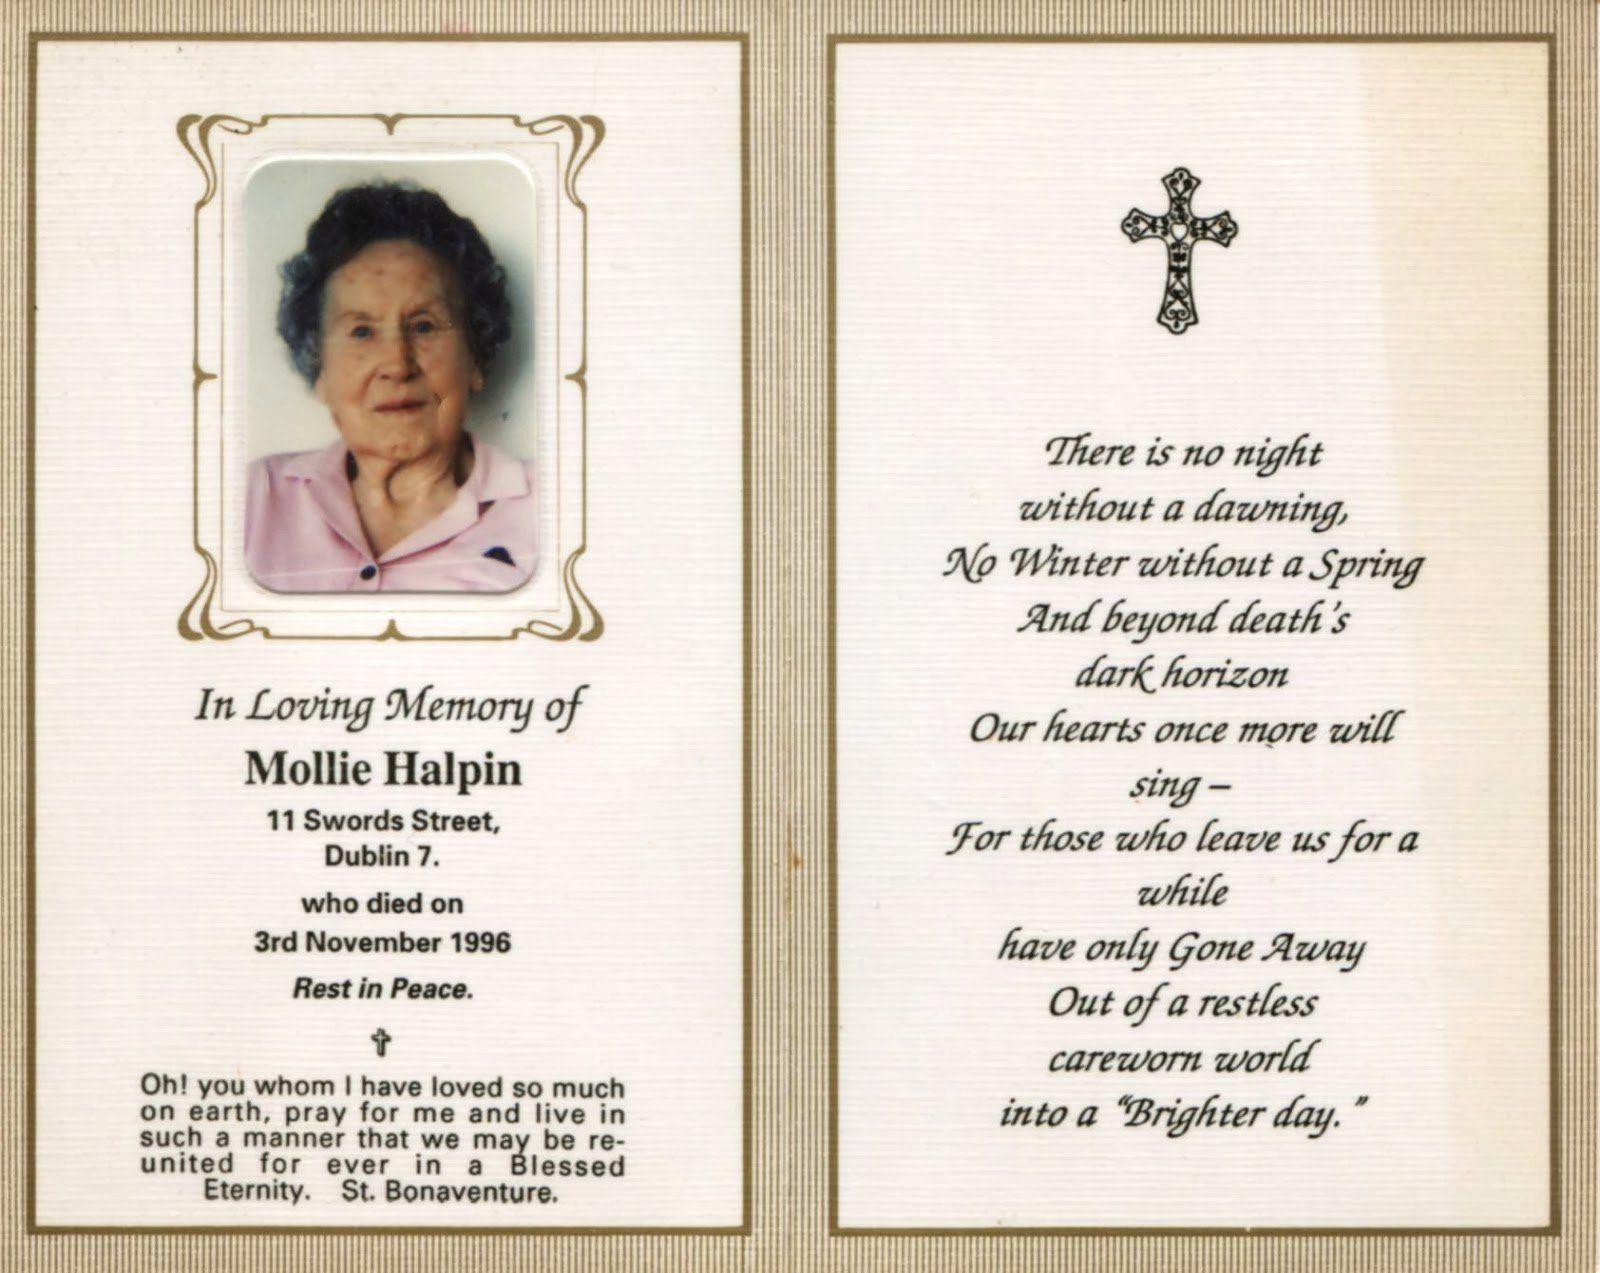 In Loving Memory Cards Unique Memorial Card Quotes Monzarglauf Verband Memorial Cards For Funeral Memorial Cards Funeral Templates Free